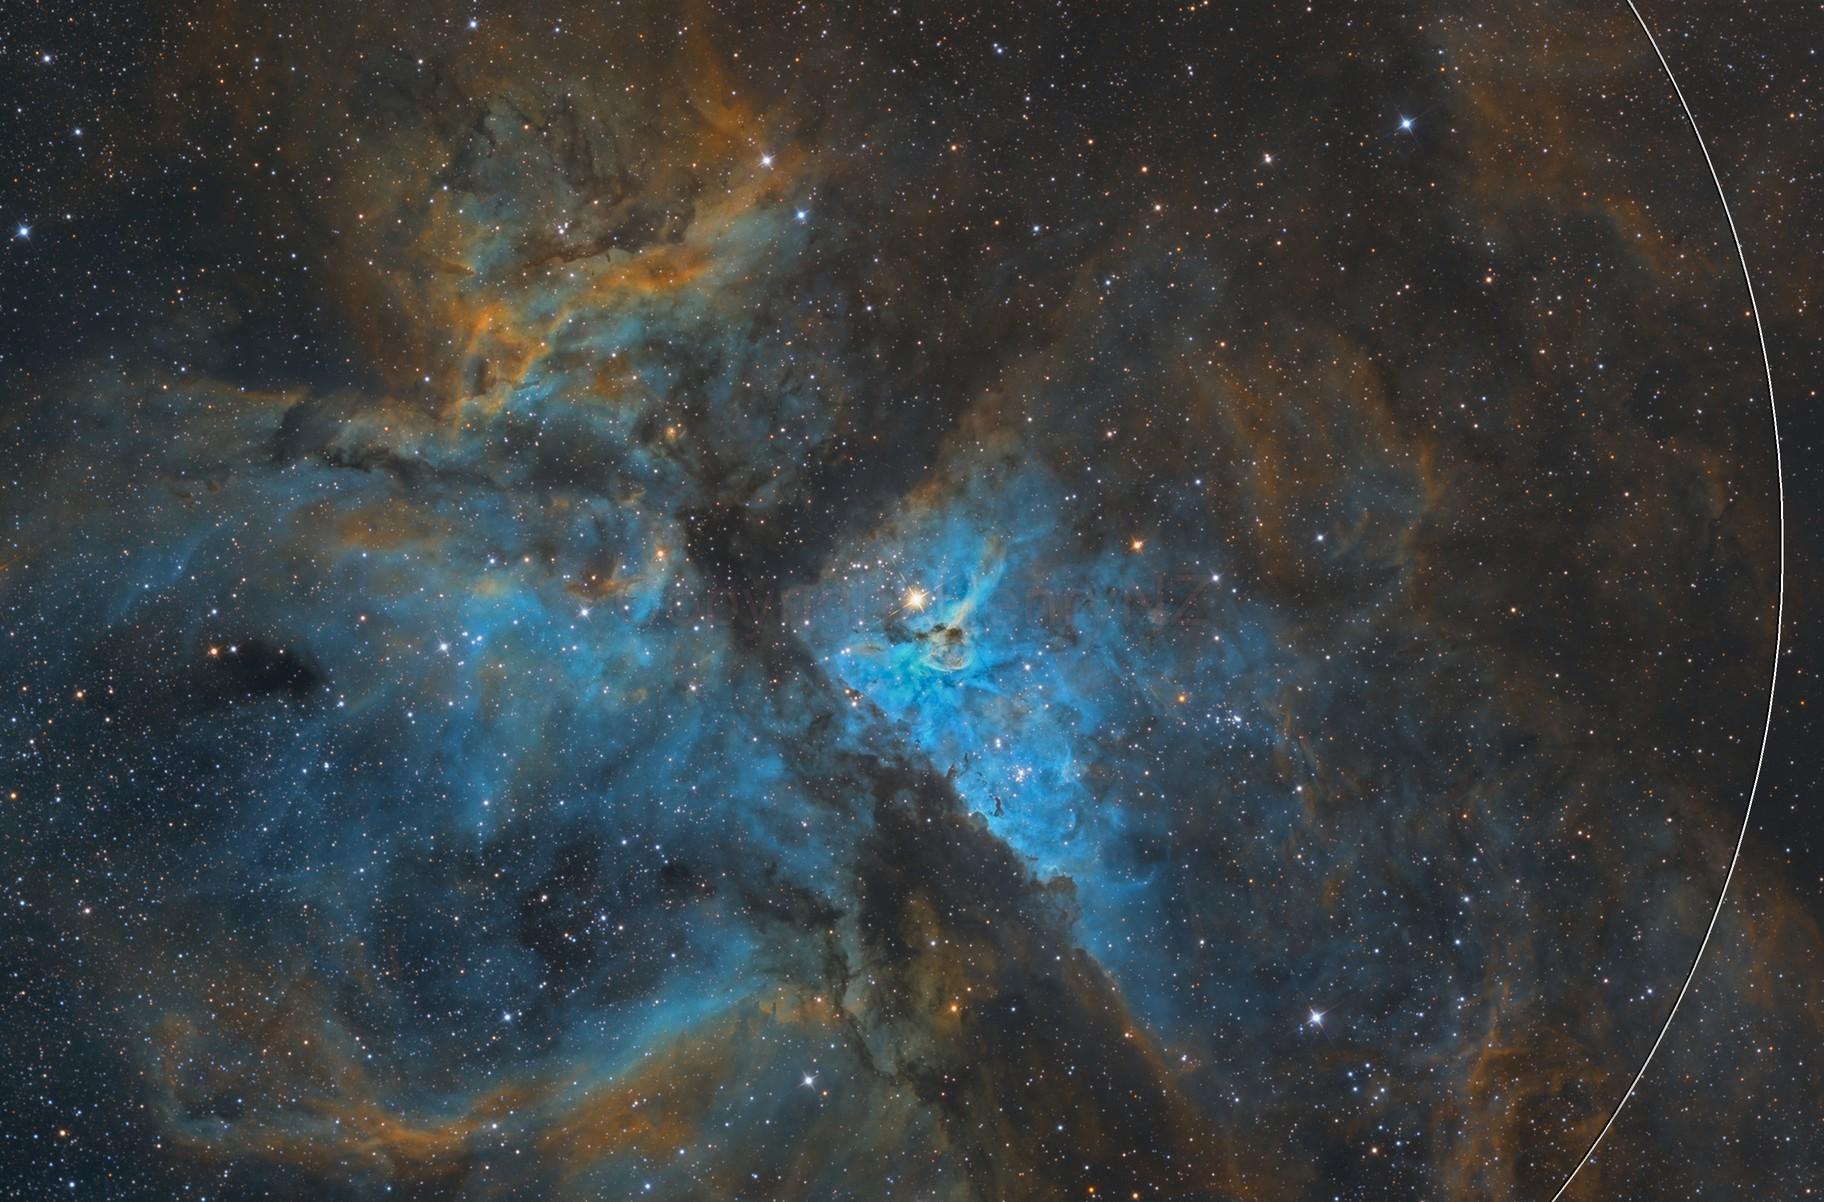 Eta Carina Nebula in Hubble Palette